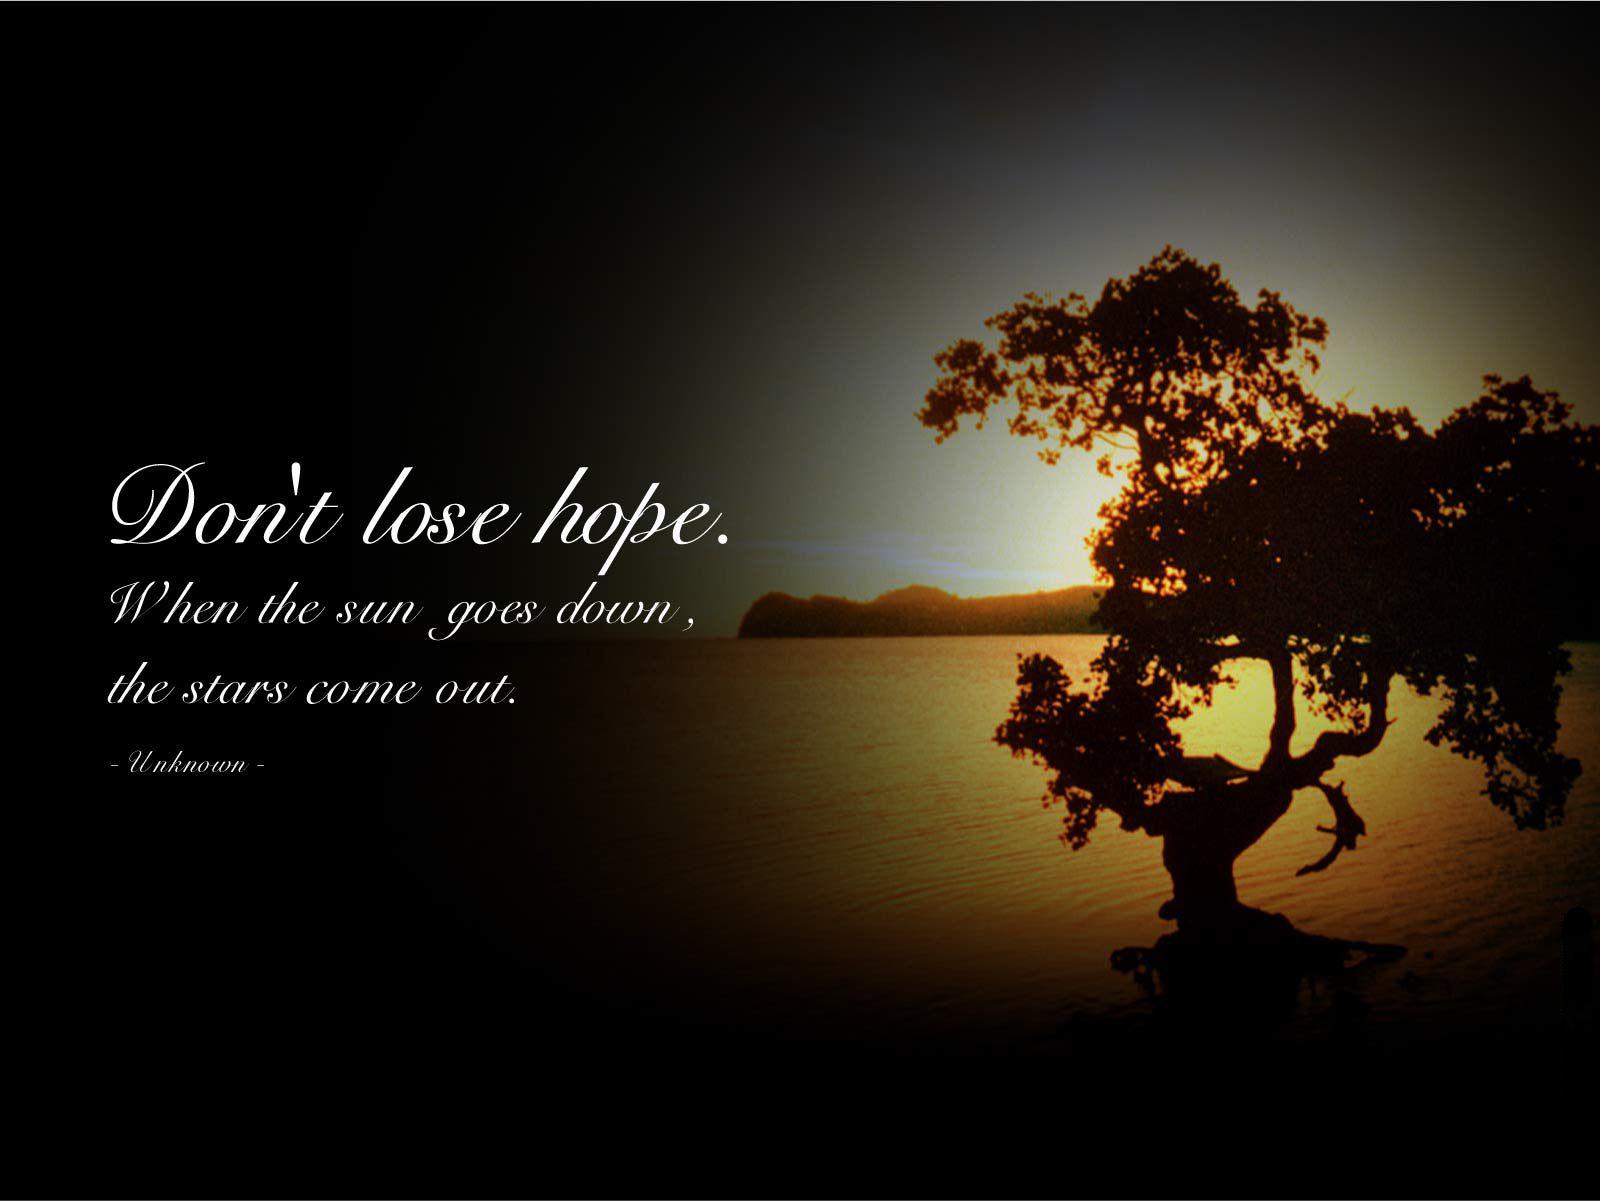 Inspirational Quotes Wallpaper For Desktop - Inspirational Quotes For Domestic Violence Victims - HD Wallpaper